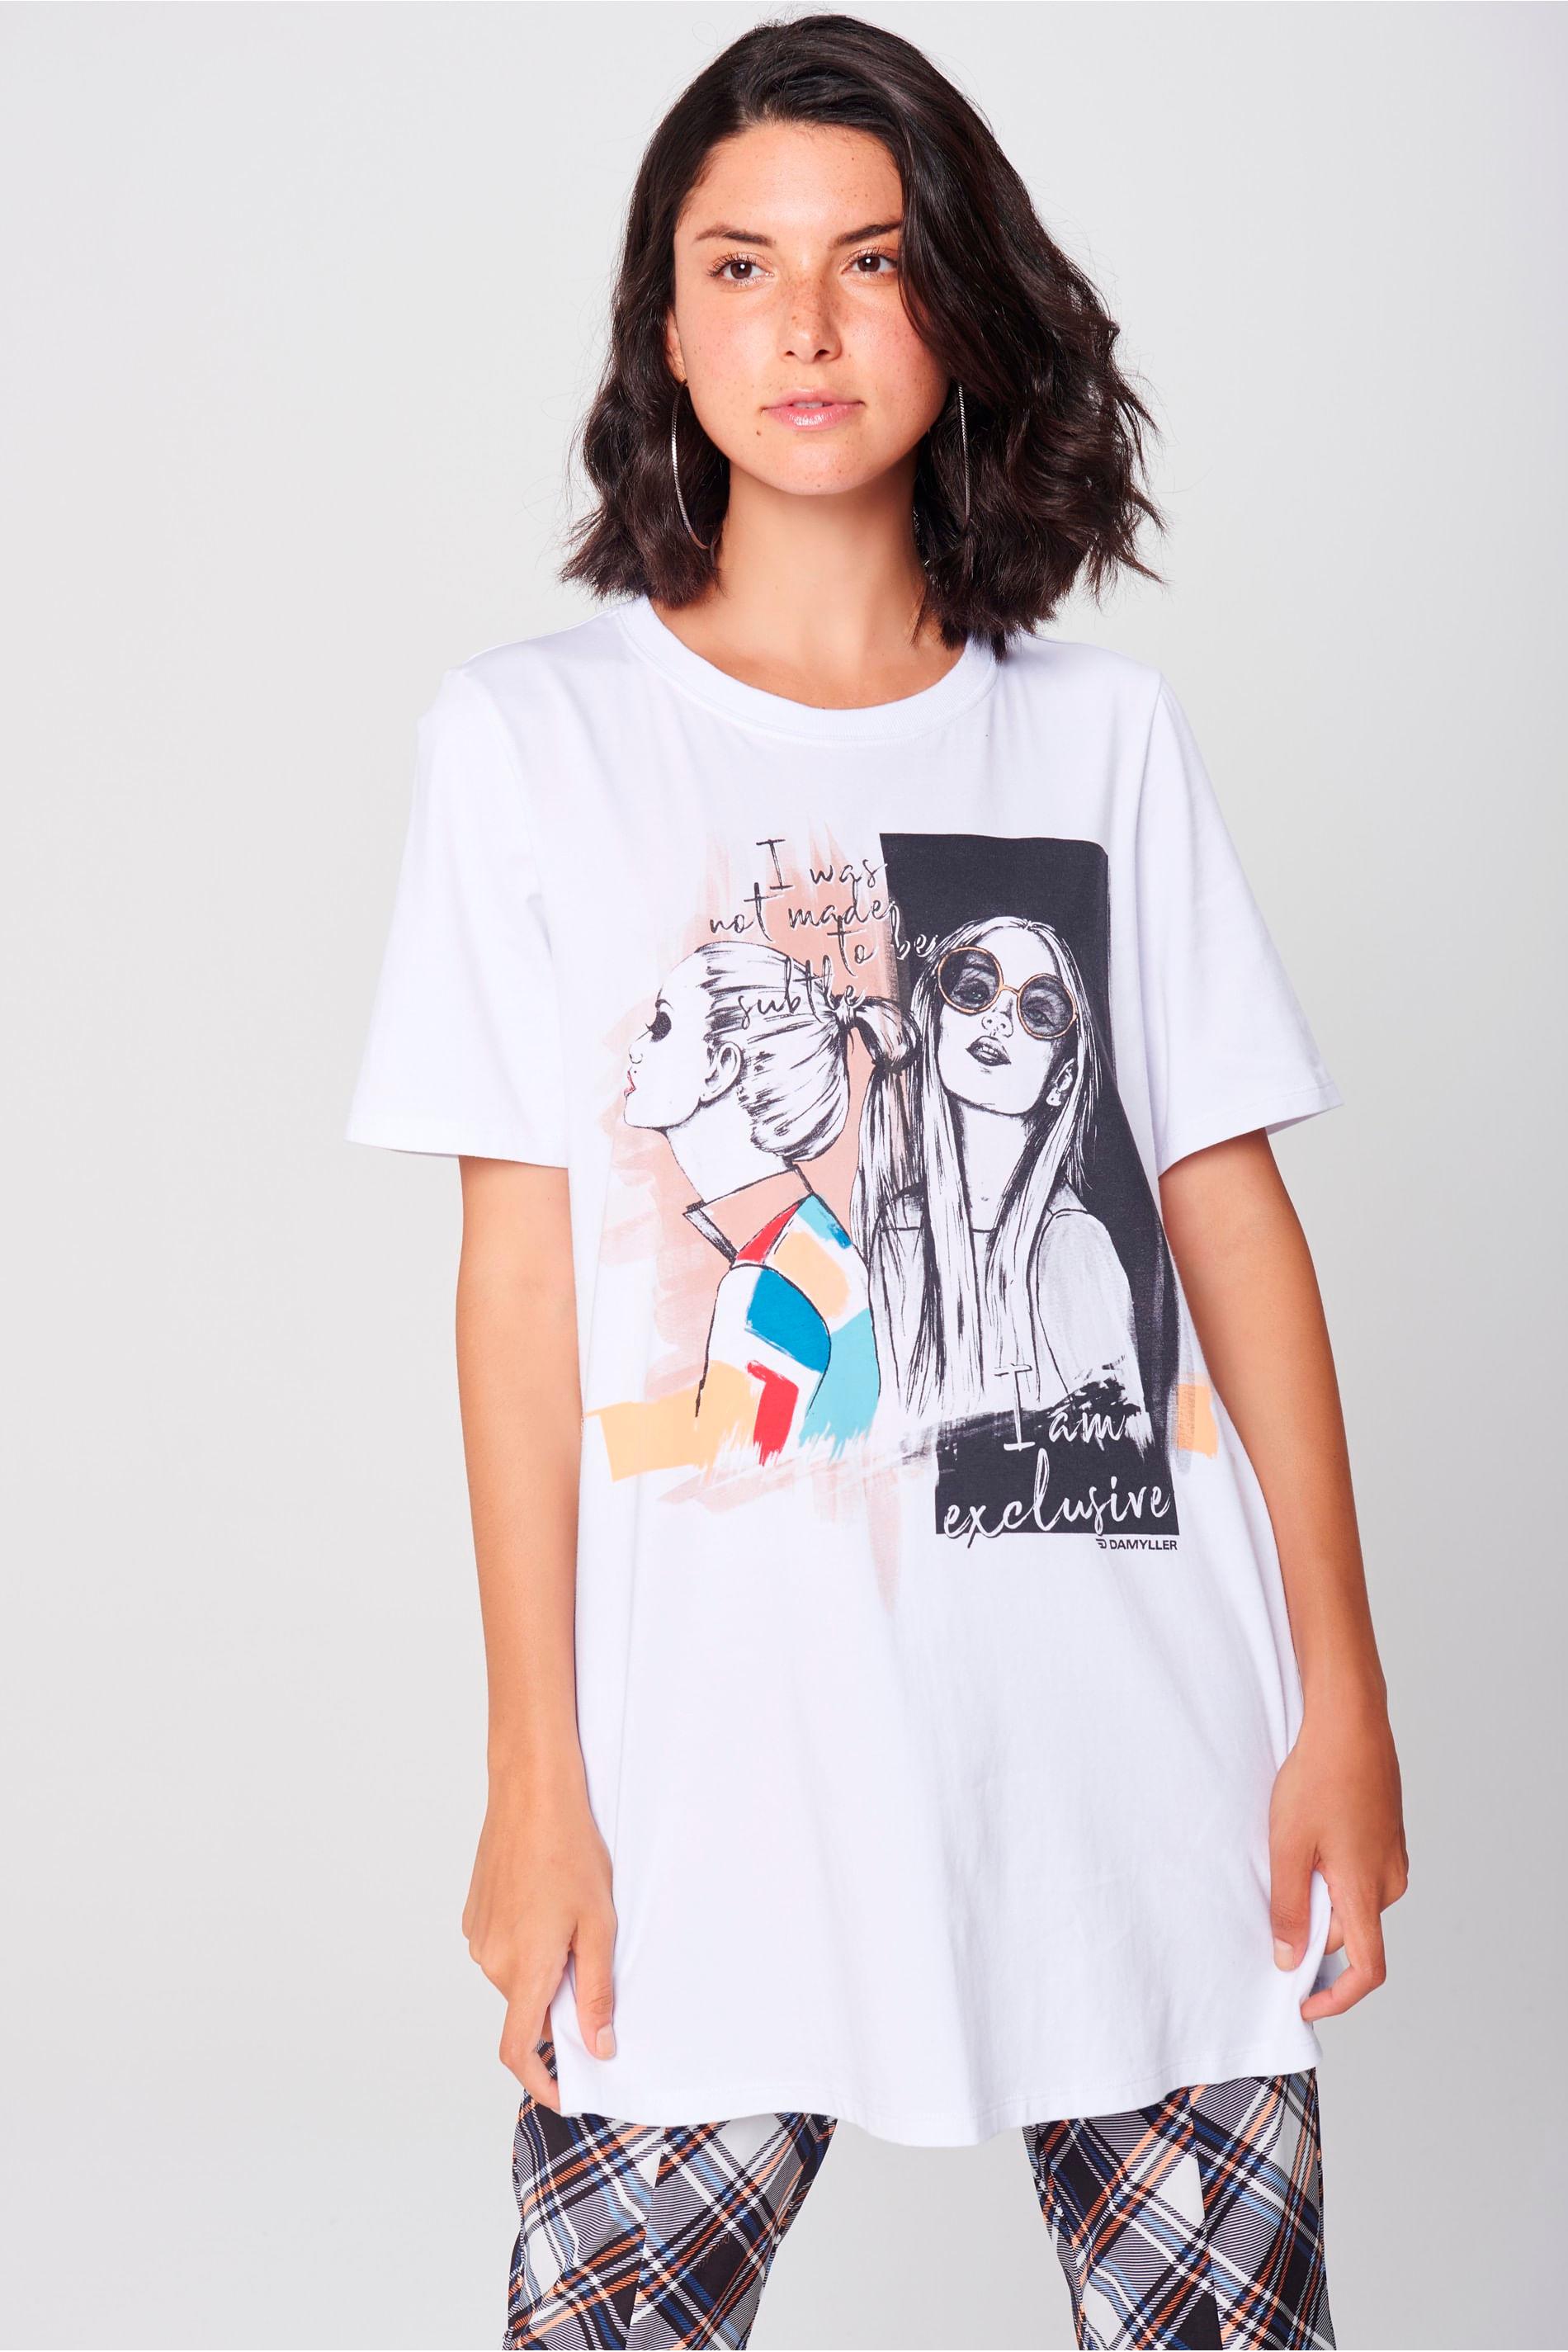 Camiseta Longa Feminina - Damyller ae106985e857f